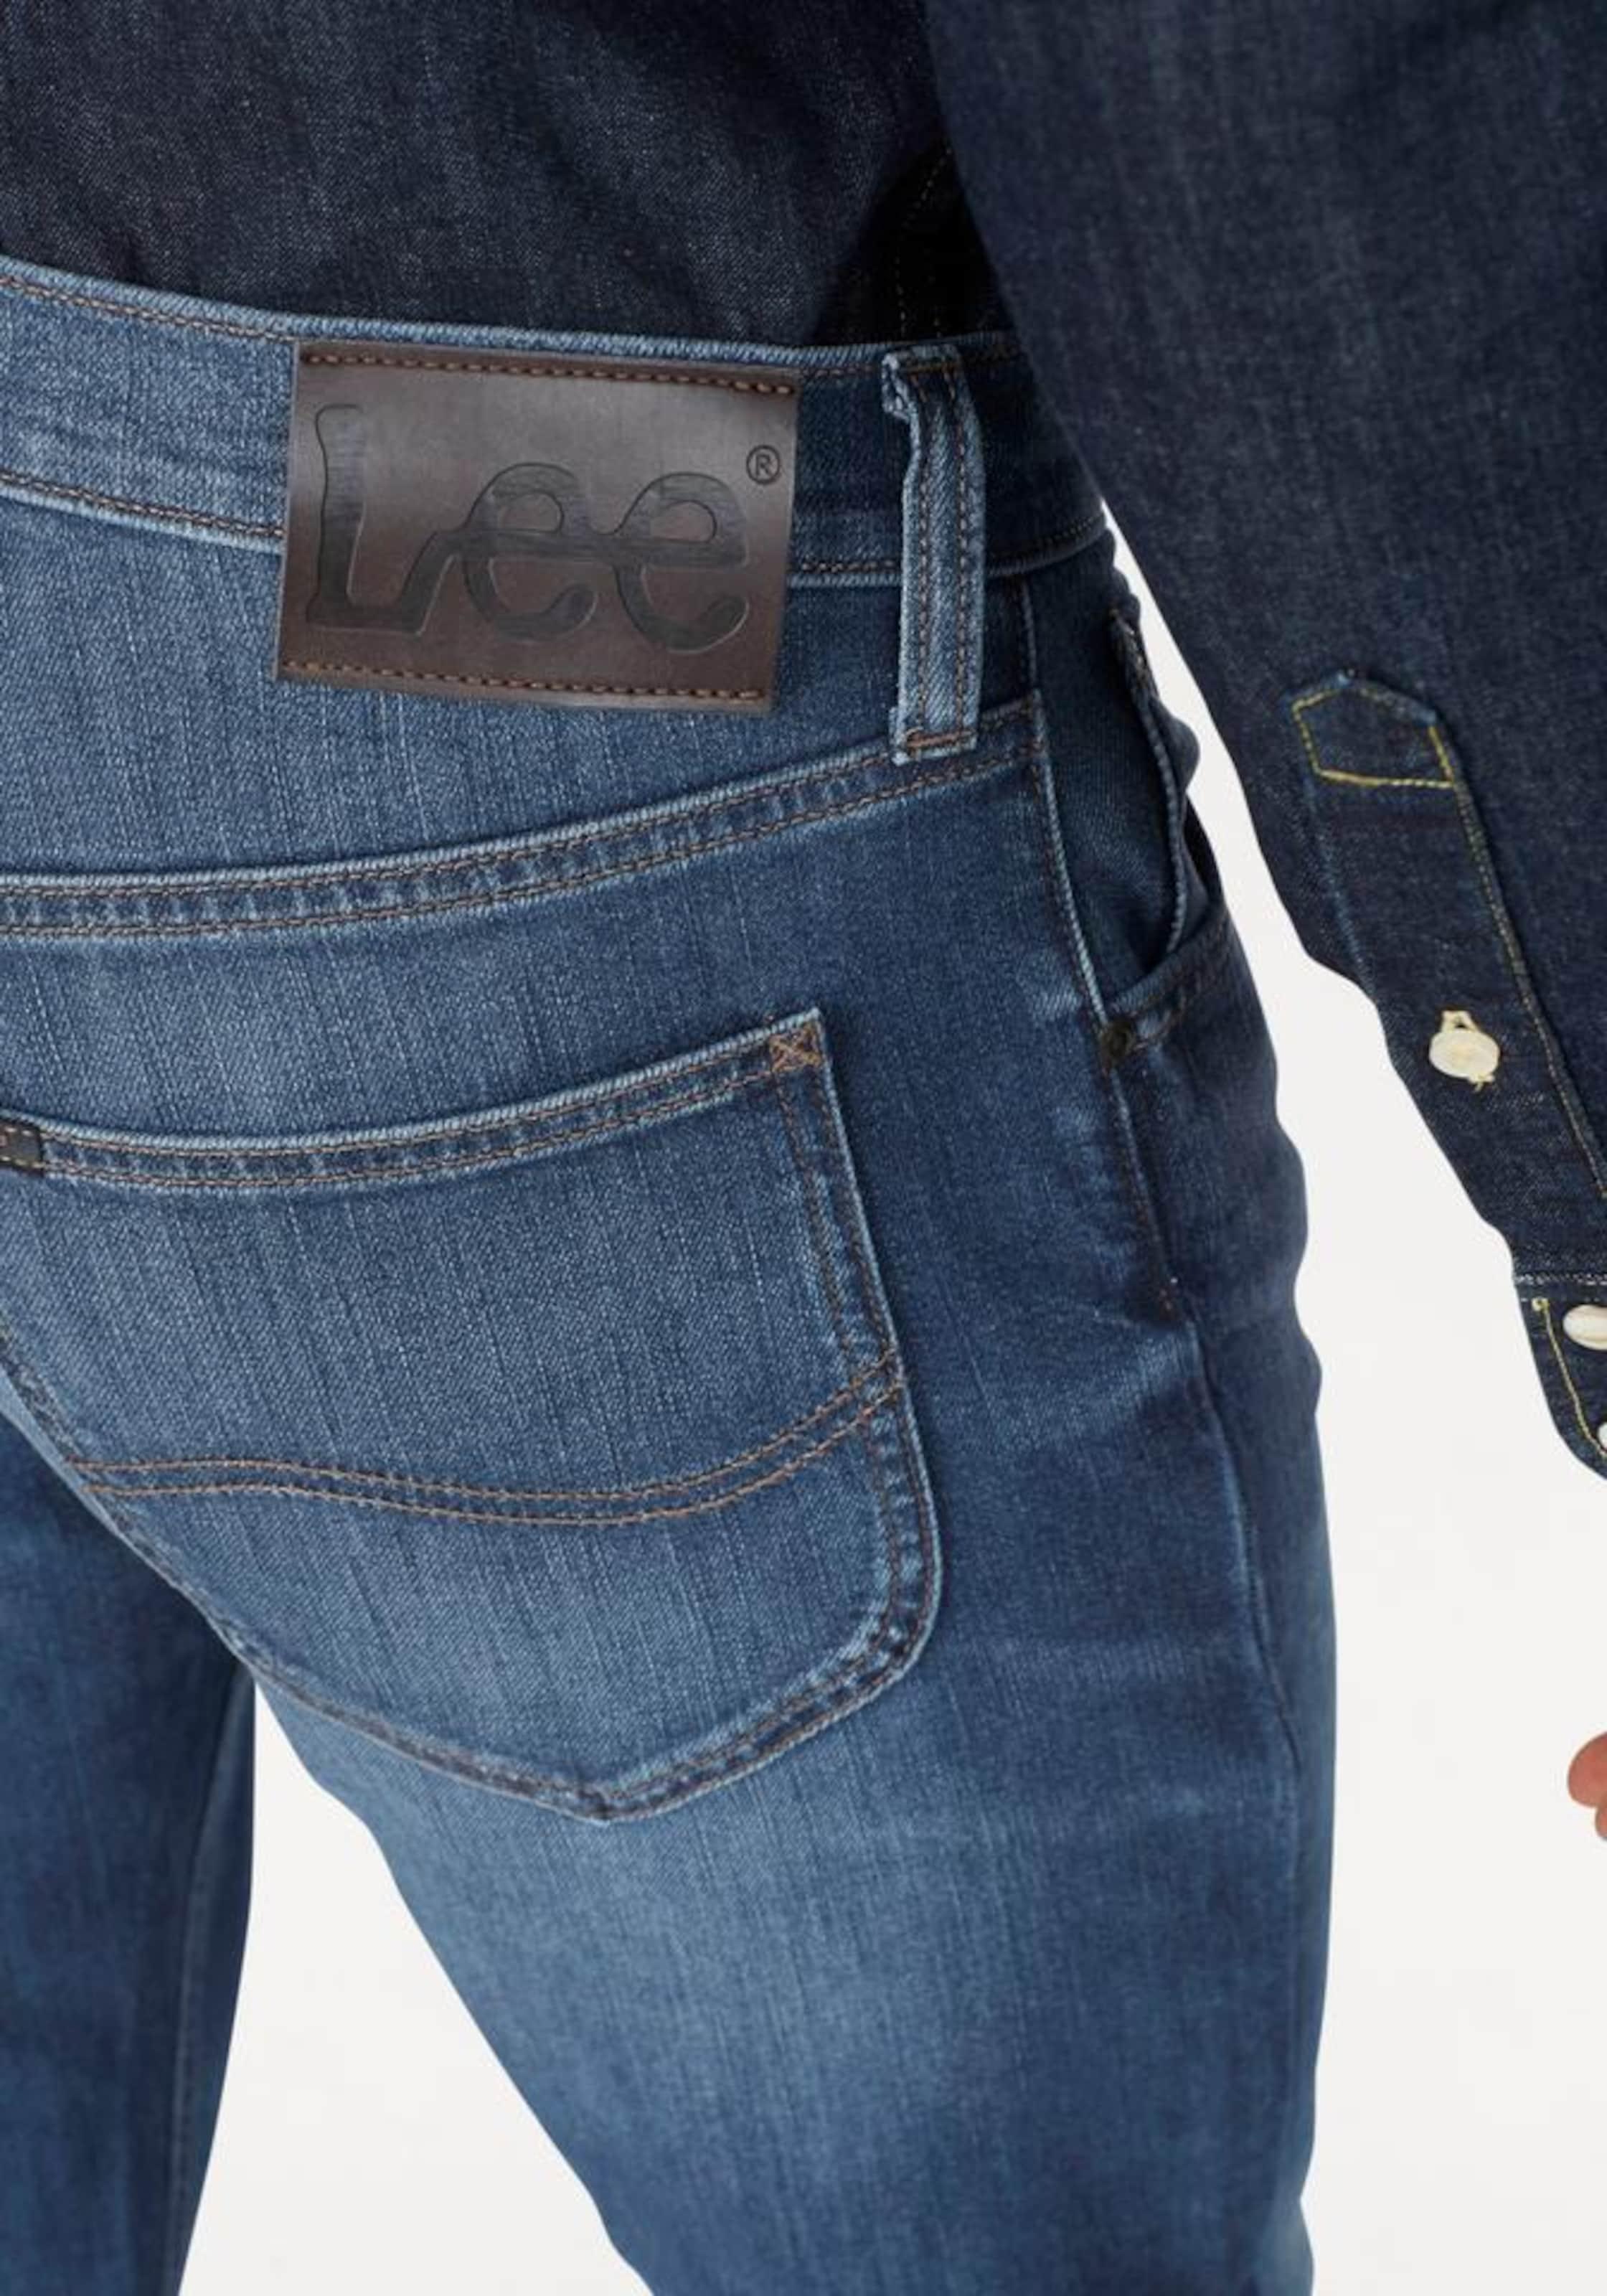 Lee Jeans Daren32 Freies Verschiffen Preiswerte Reale YhIxxI